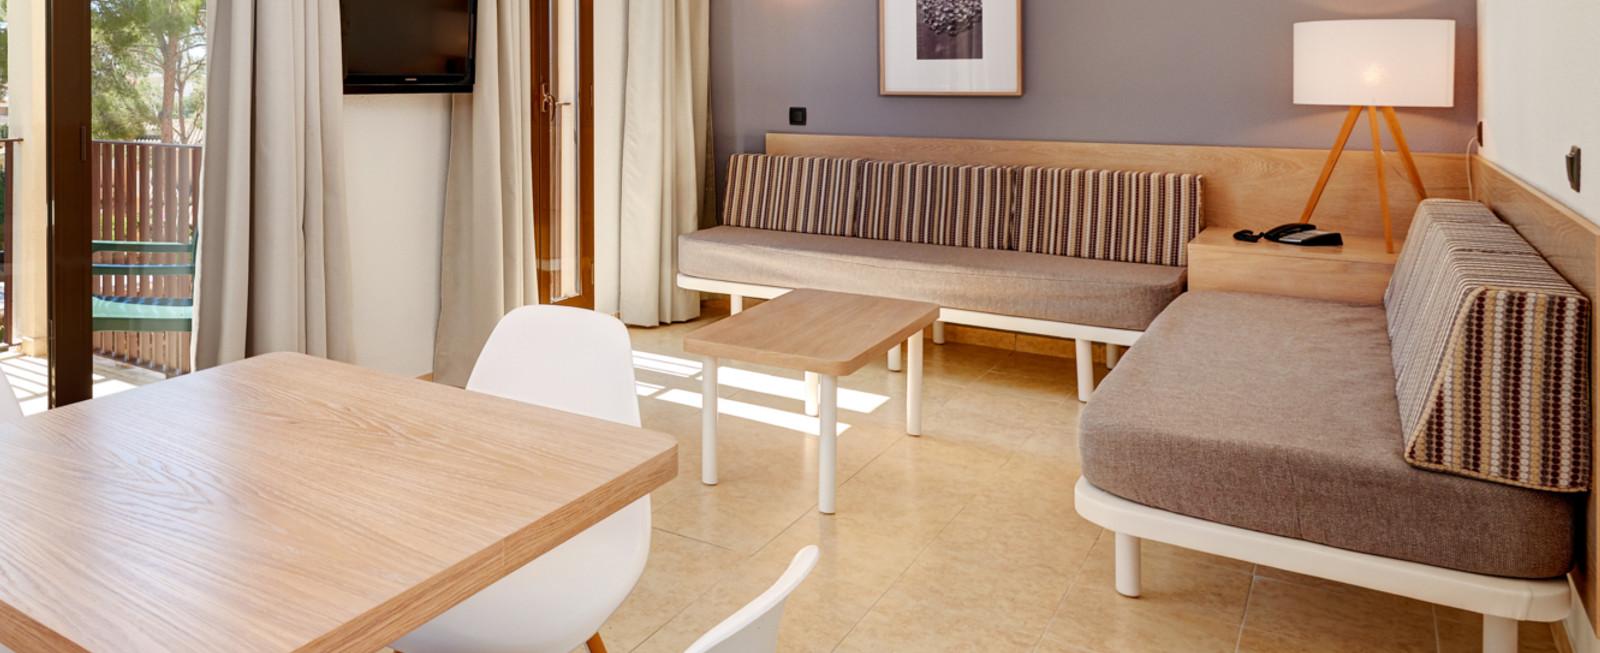 apartamento-renovado-jacuzzi-protur-floriana-resort